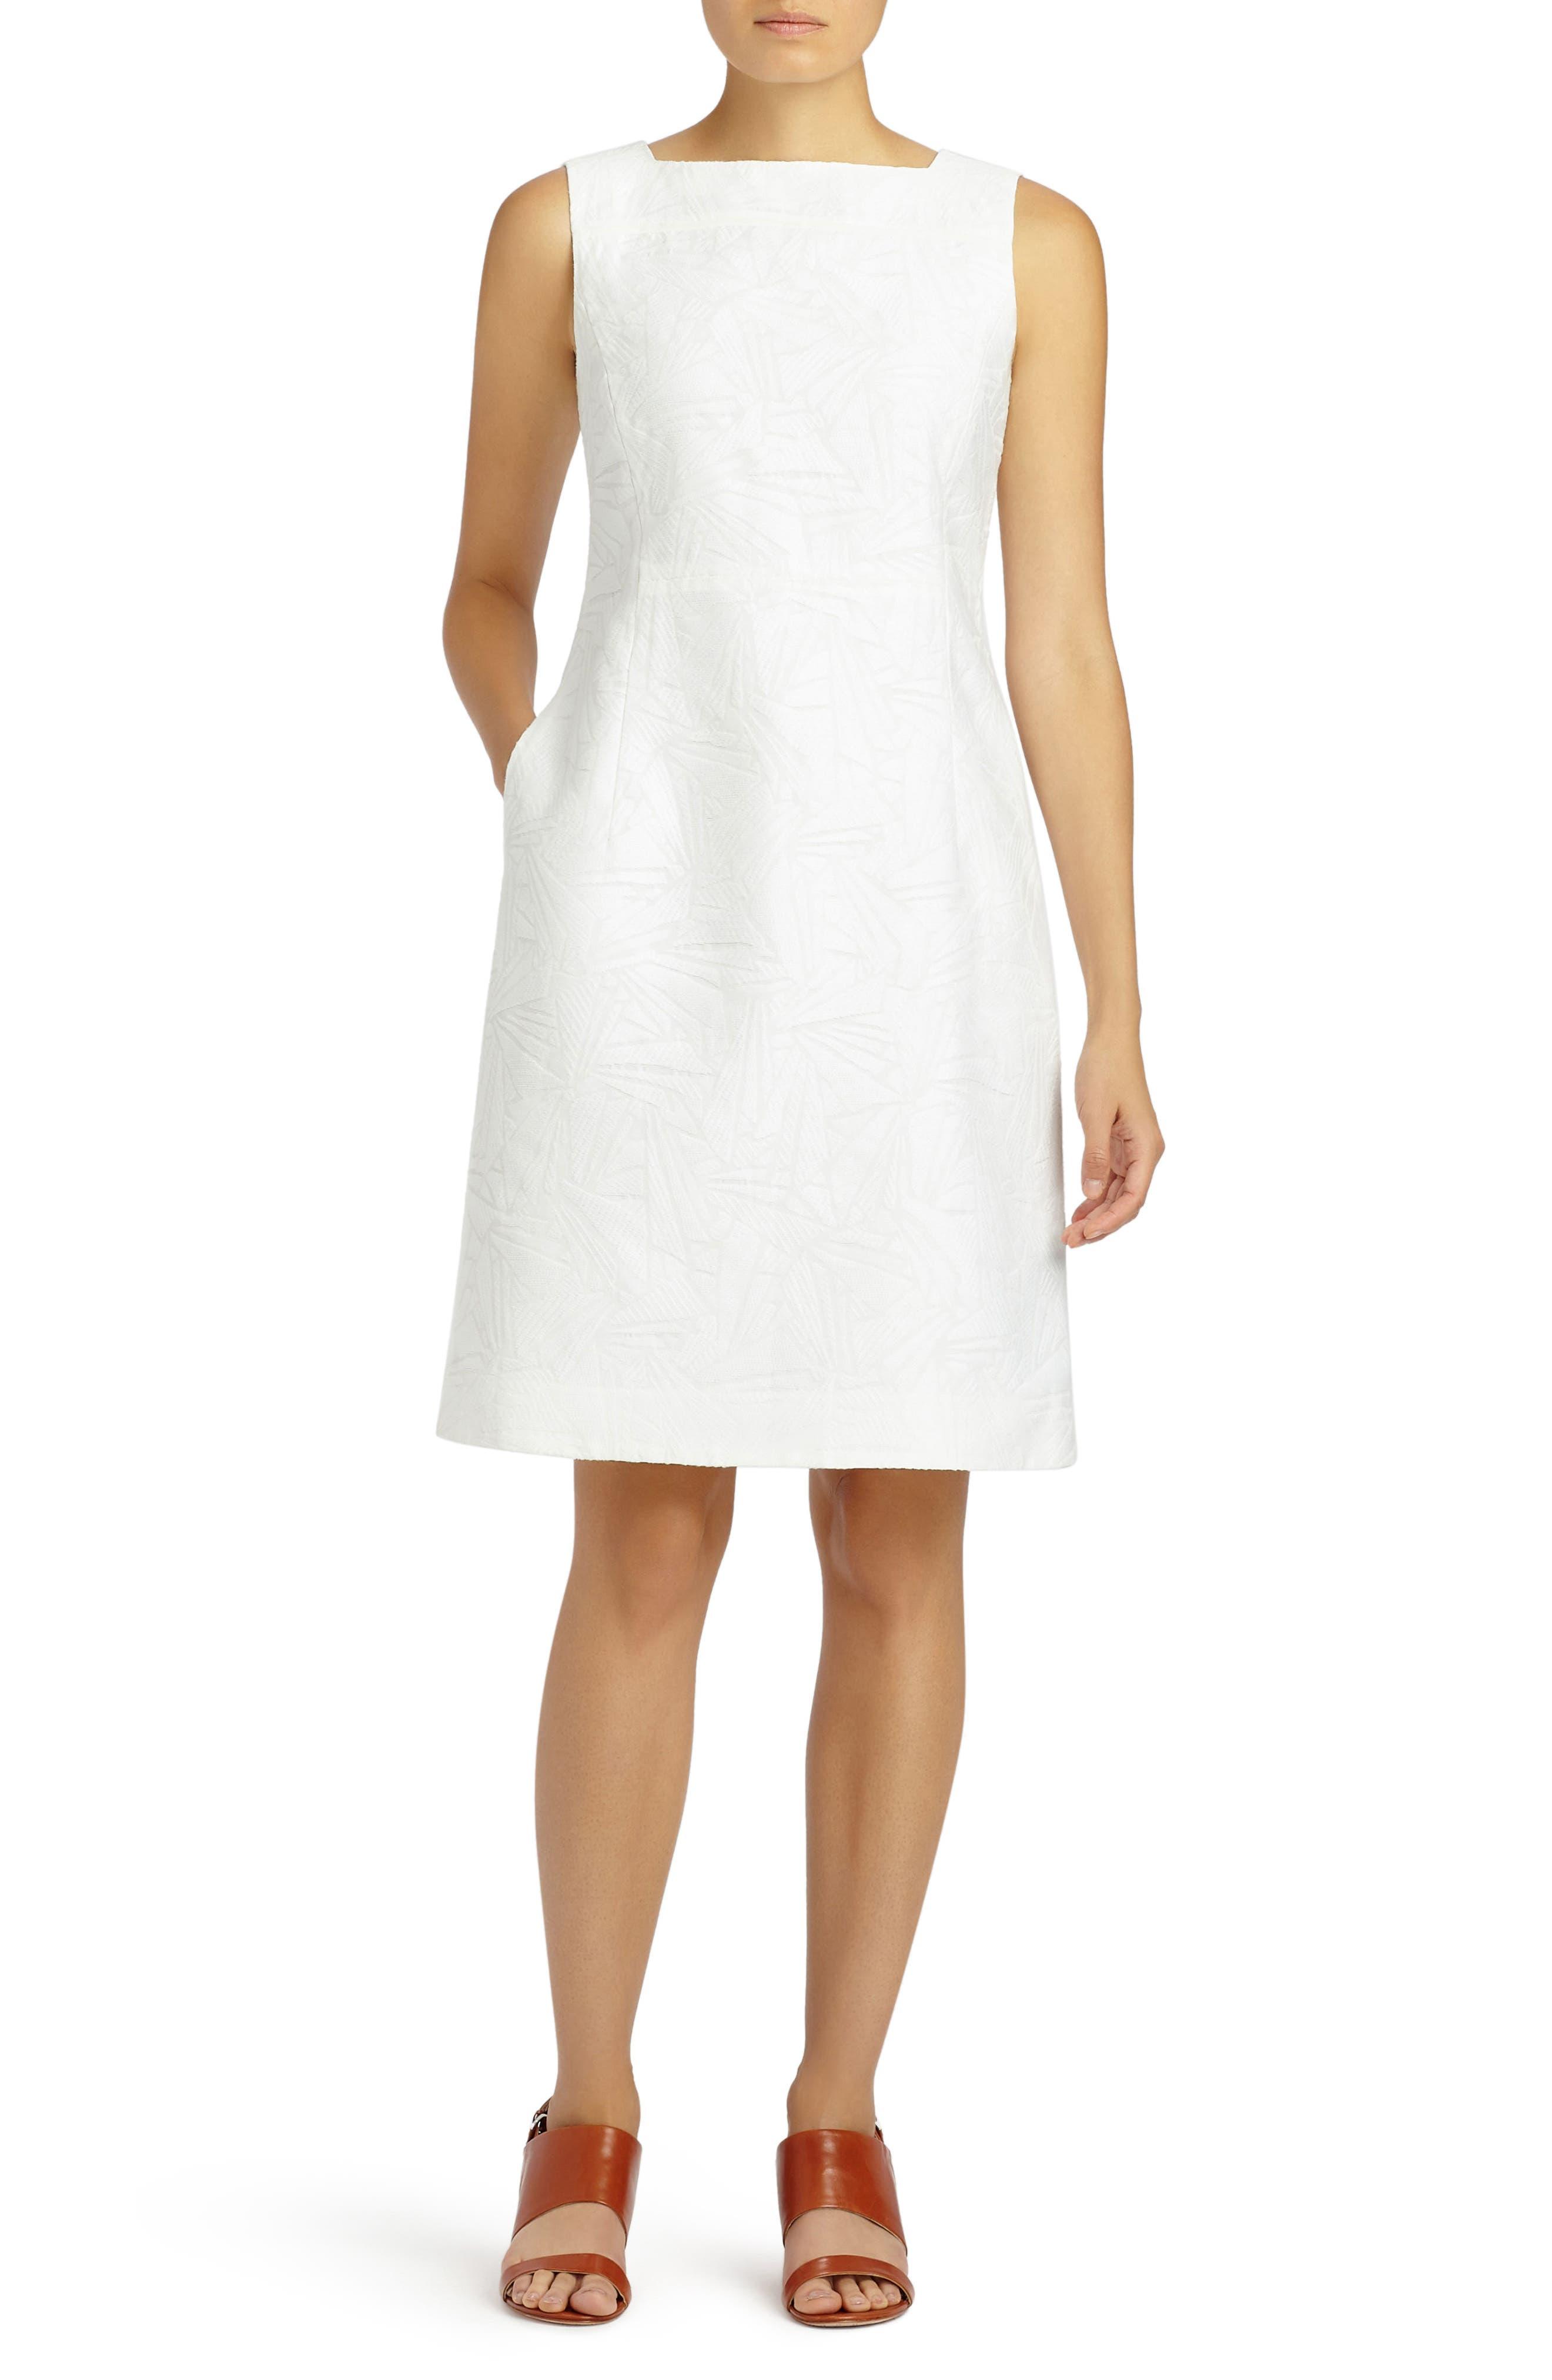 Alternate Image 1 Selected - Lafayette 148 New York Jojo Fragmented Jacquard Dress